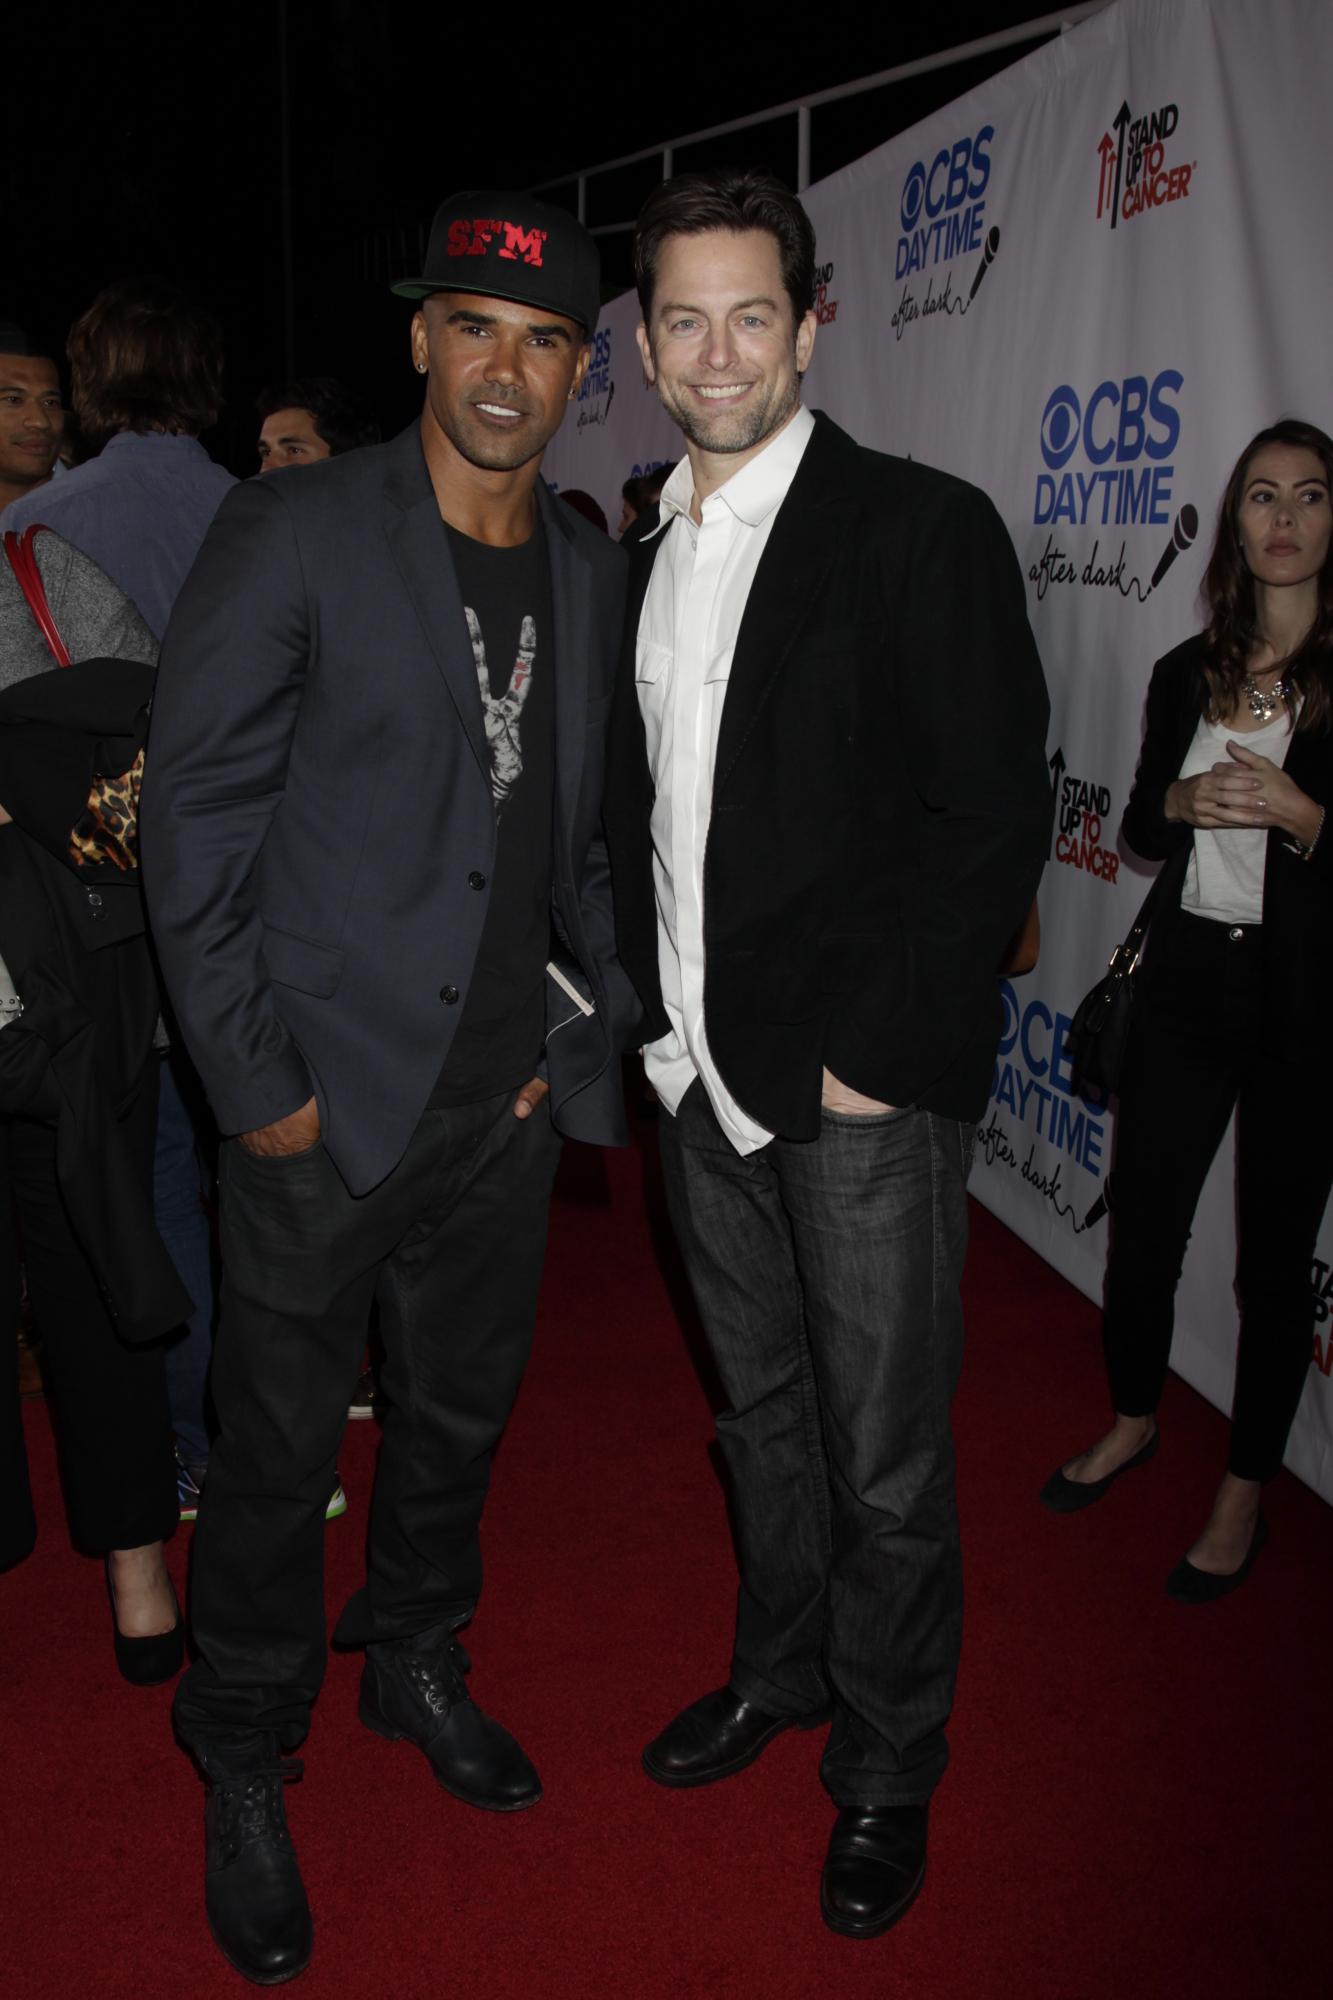 Shemar and Michael